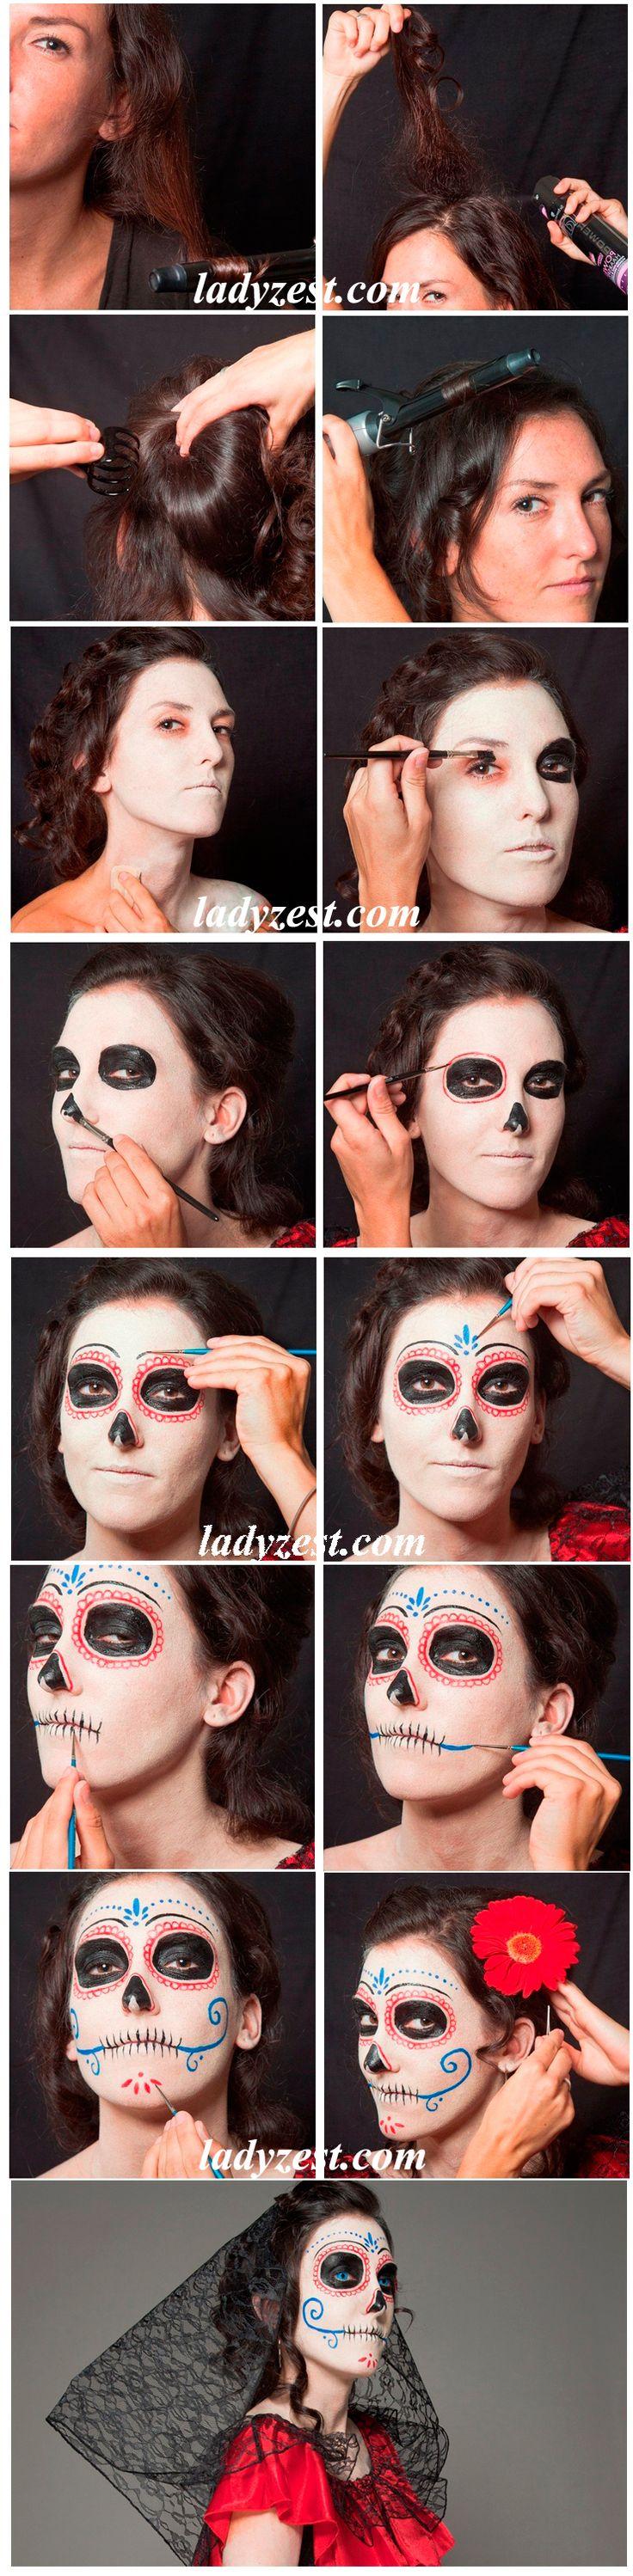 Макияж на Хэллоуин   Страшный макияж на Хэллоуин фото   Женский журнал Ladyzest.com